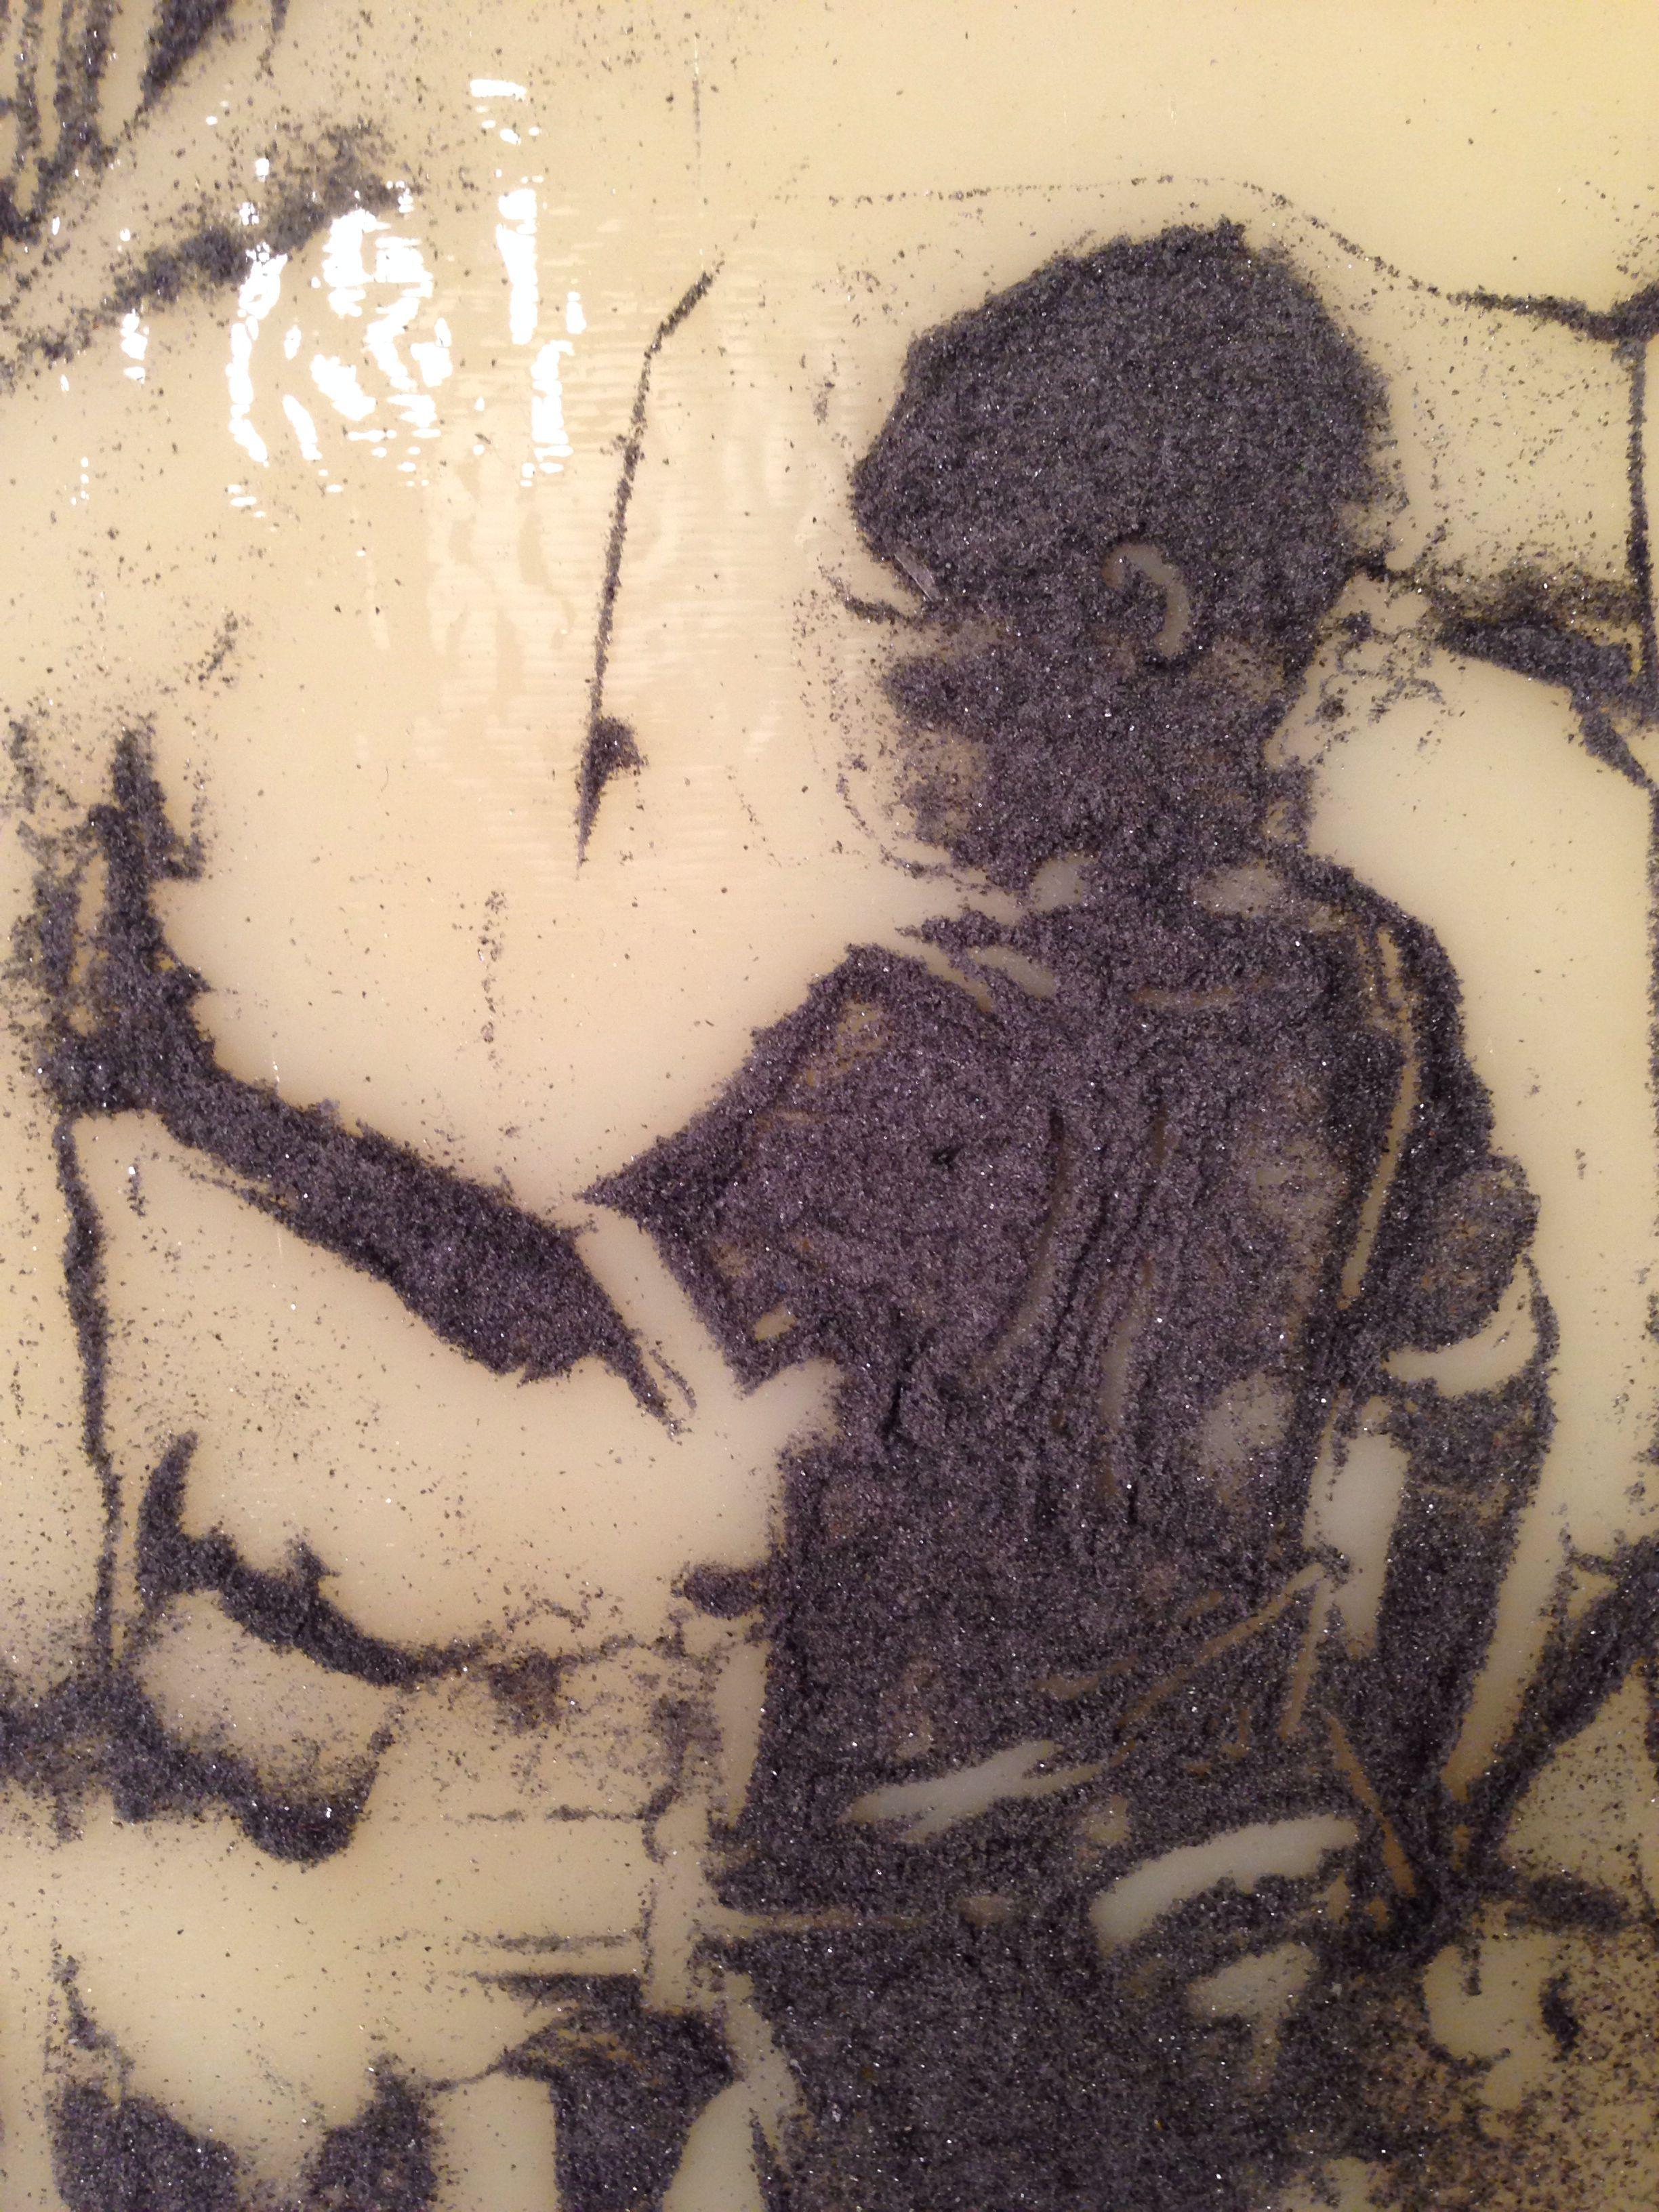 (Before firing) glass sgraffito drawing. 2014 Kelly Crosser Alge